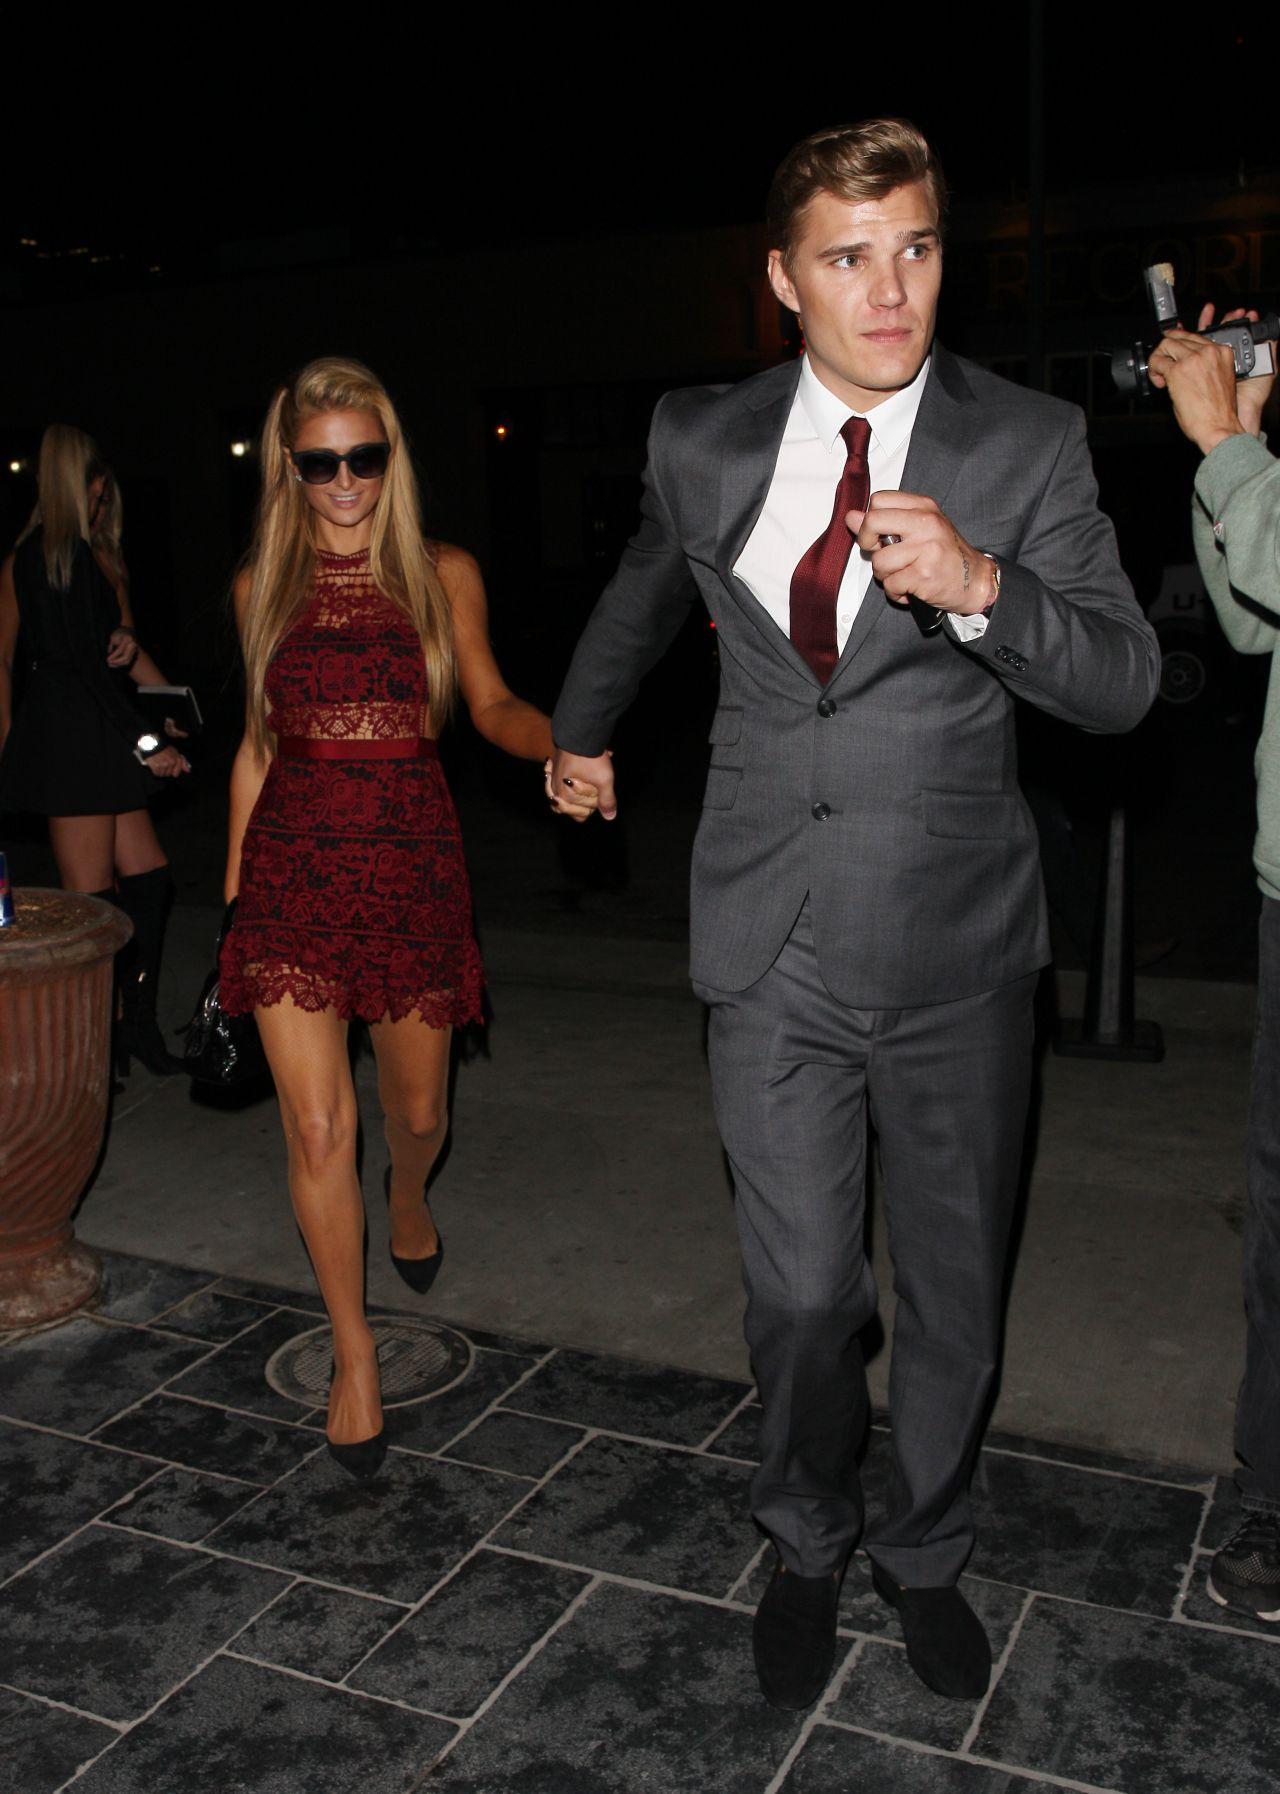 Paris Hilton and Boyfriend Chris Zylka Party at Tao Night ... пэрис хилтон